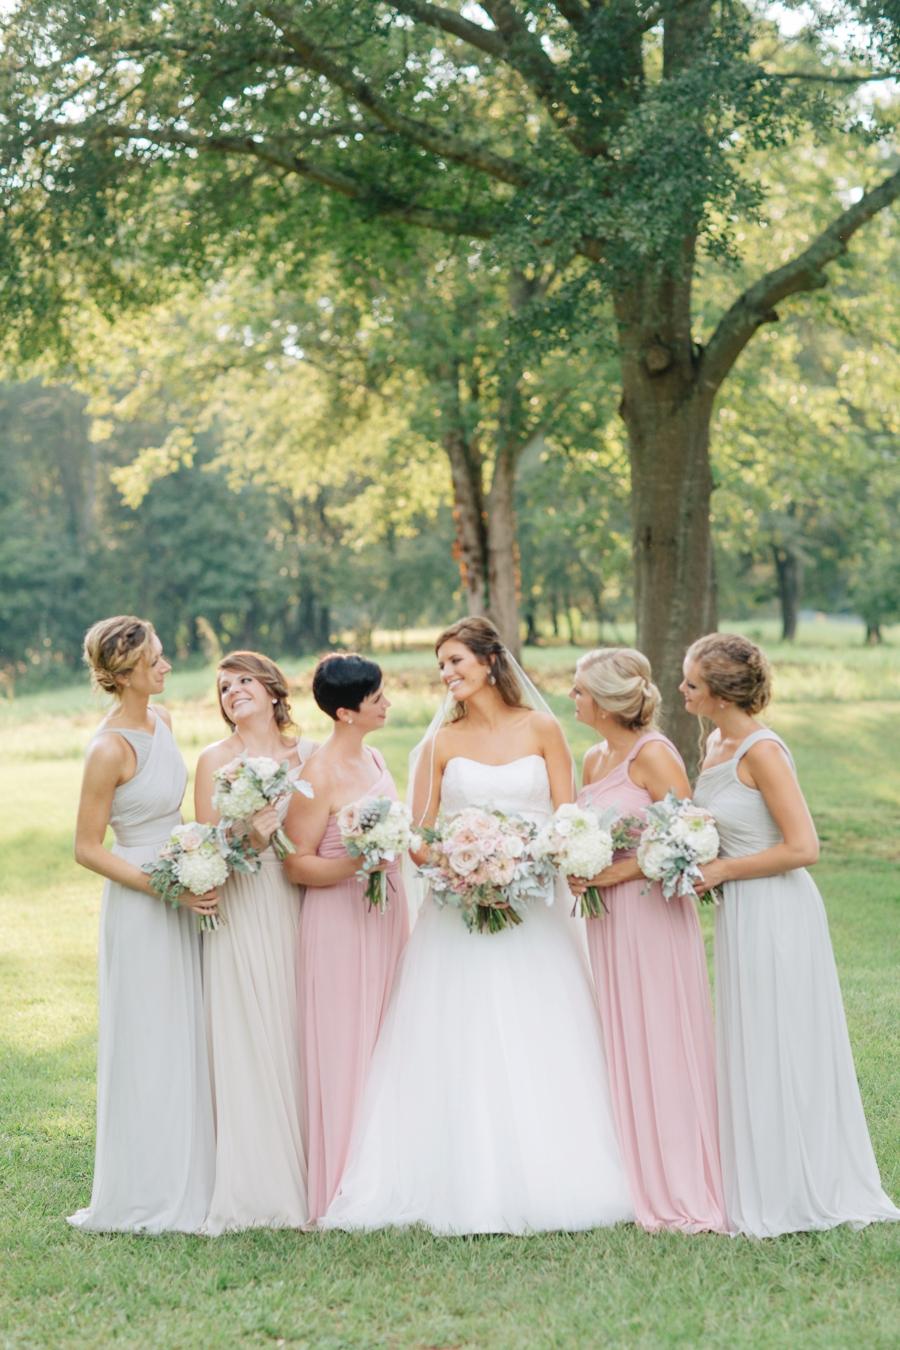 A Blush & Champagne Georgia Wedding via TheELD.com